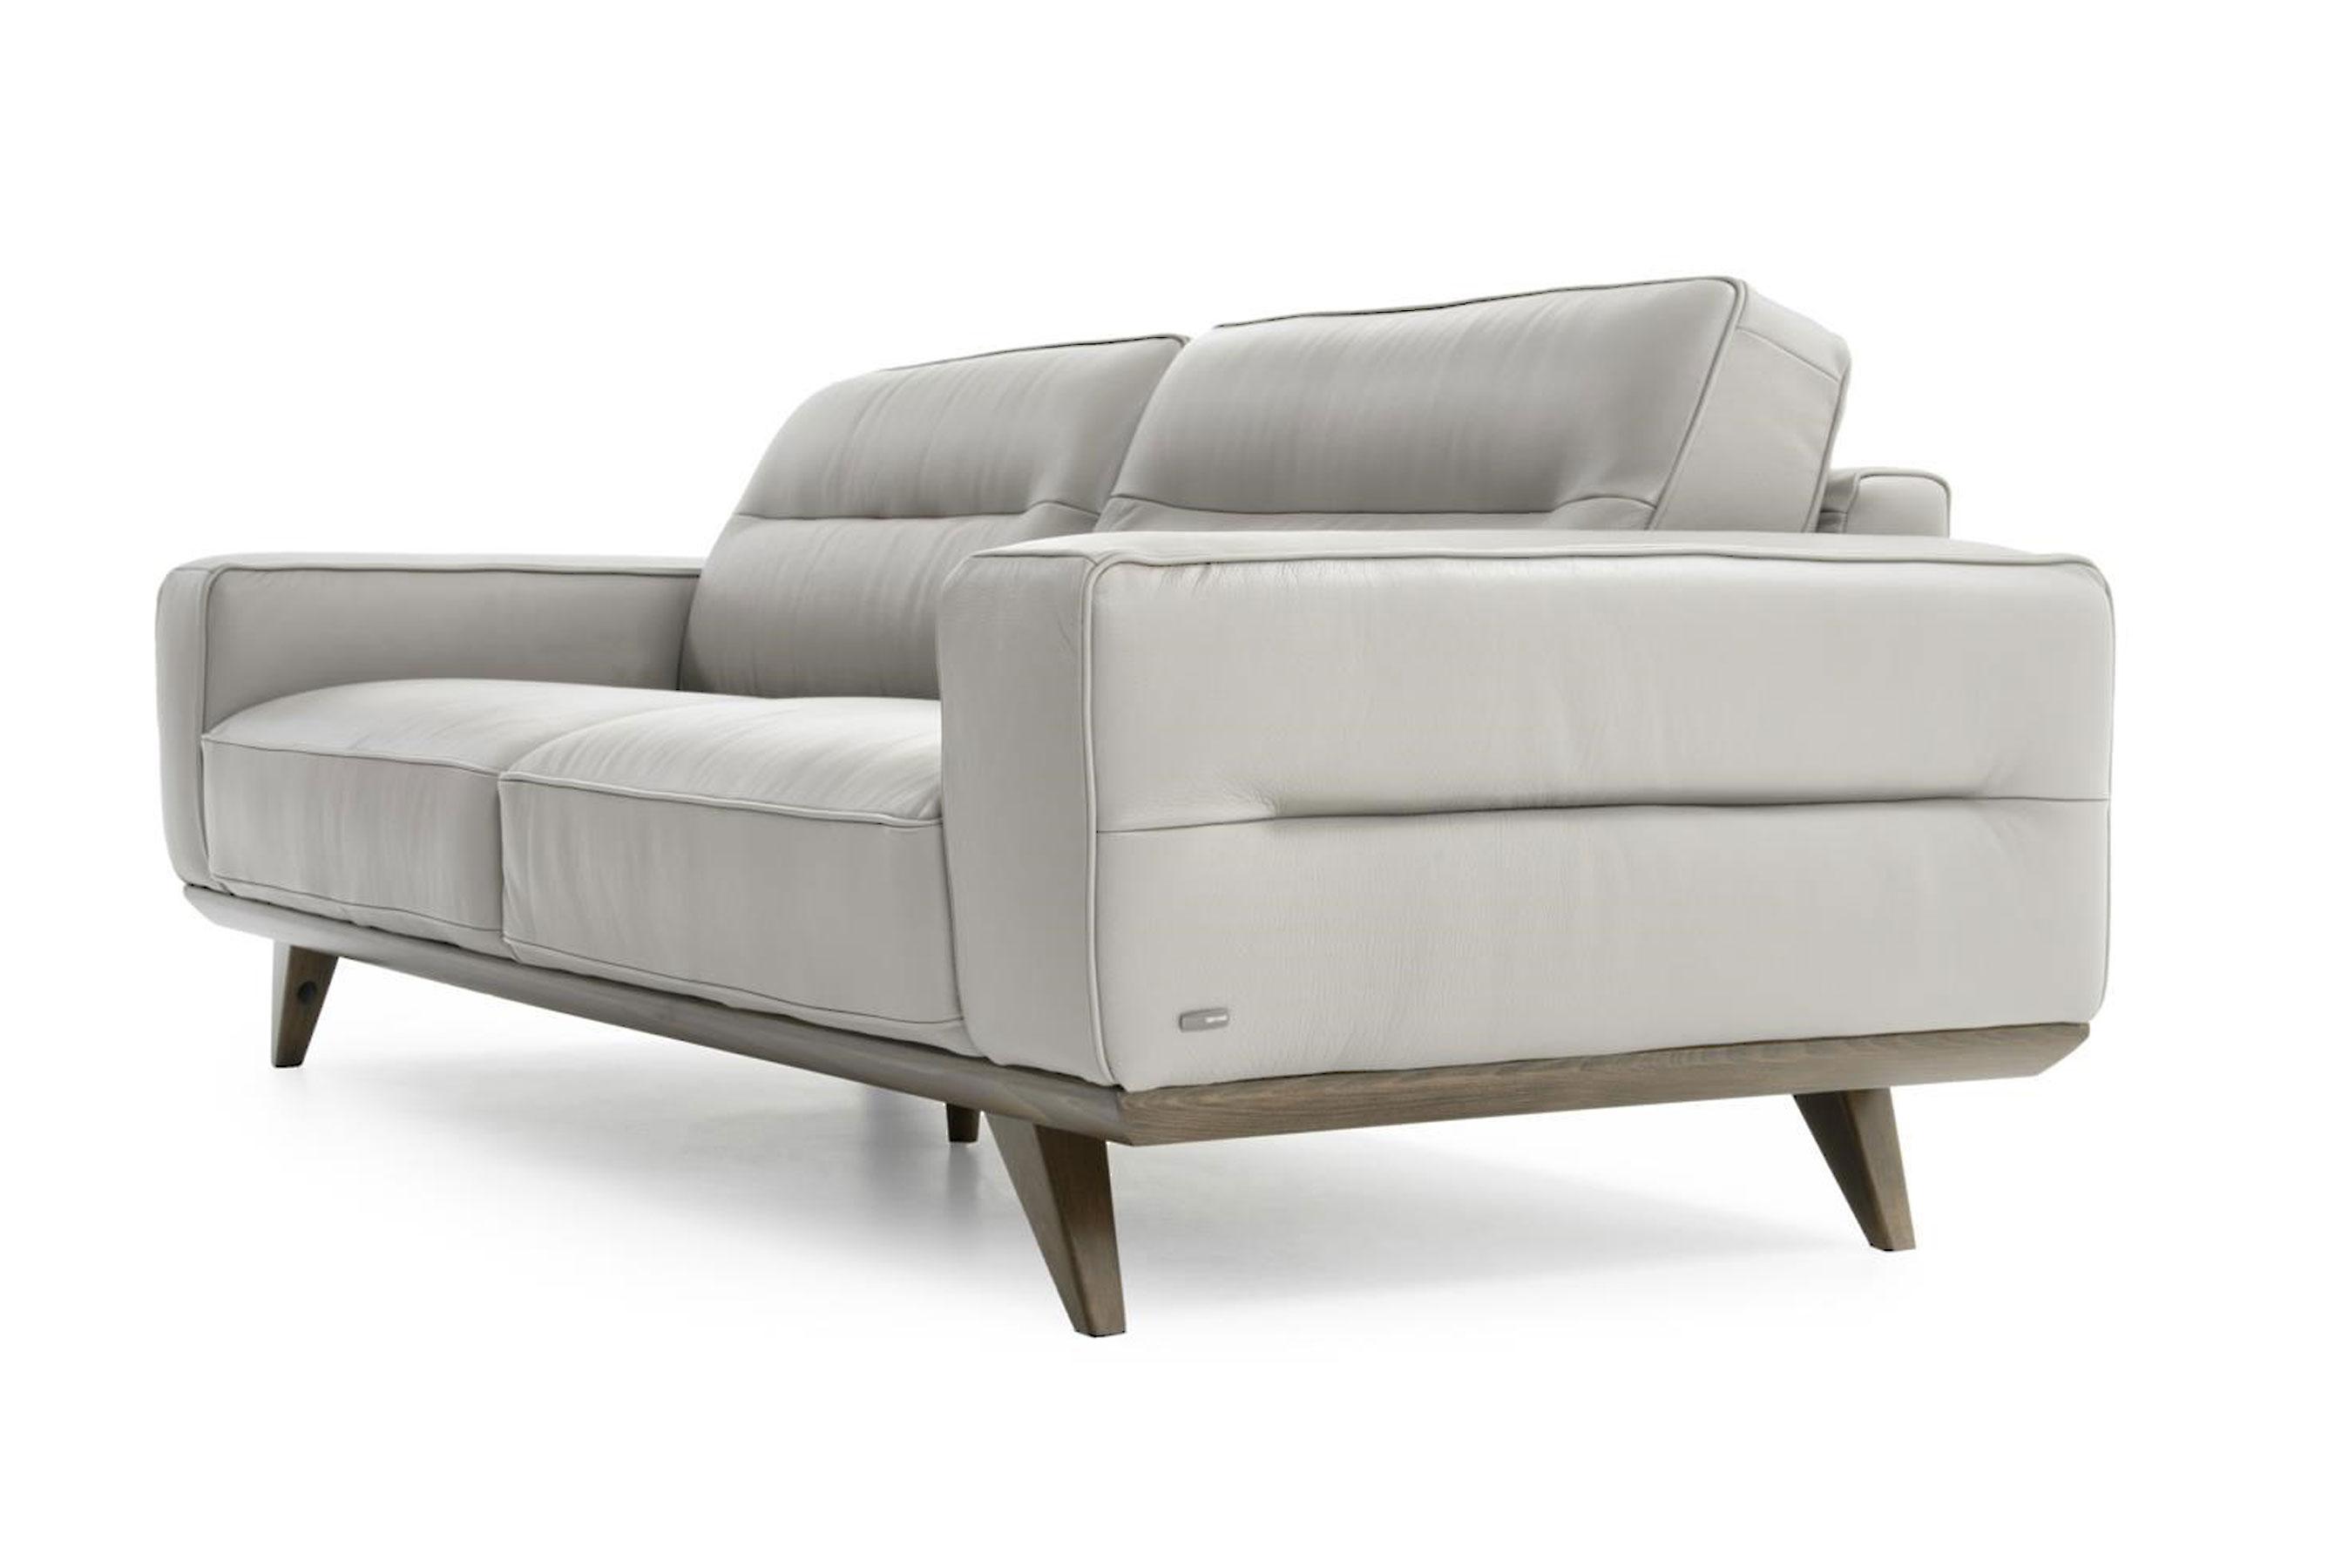 Natuzzi Fabric Sofa Review Natuzzi Editions C054 Corner ...